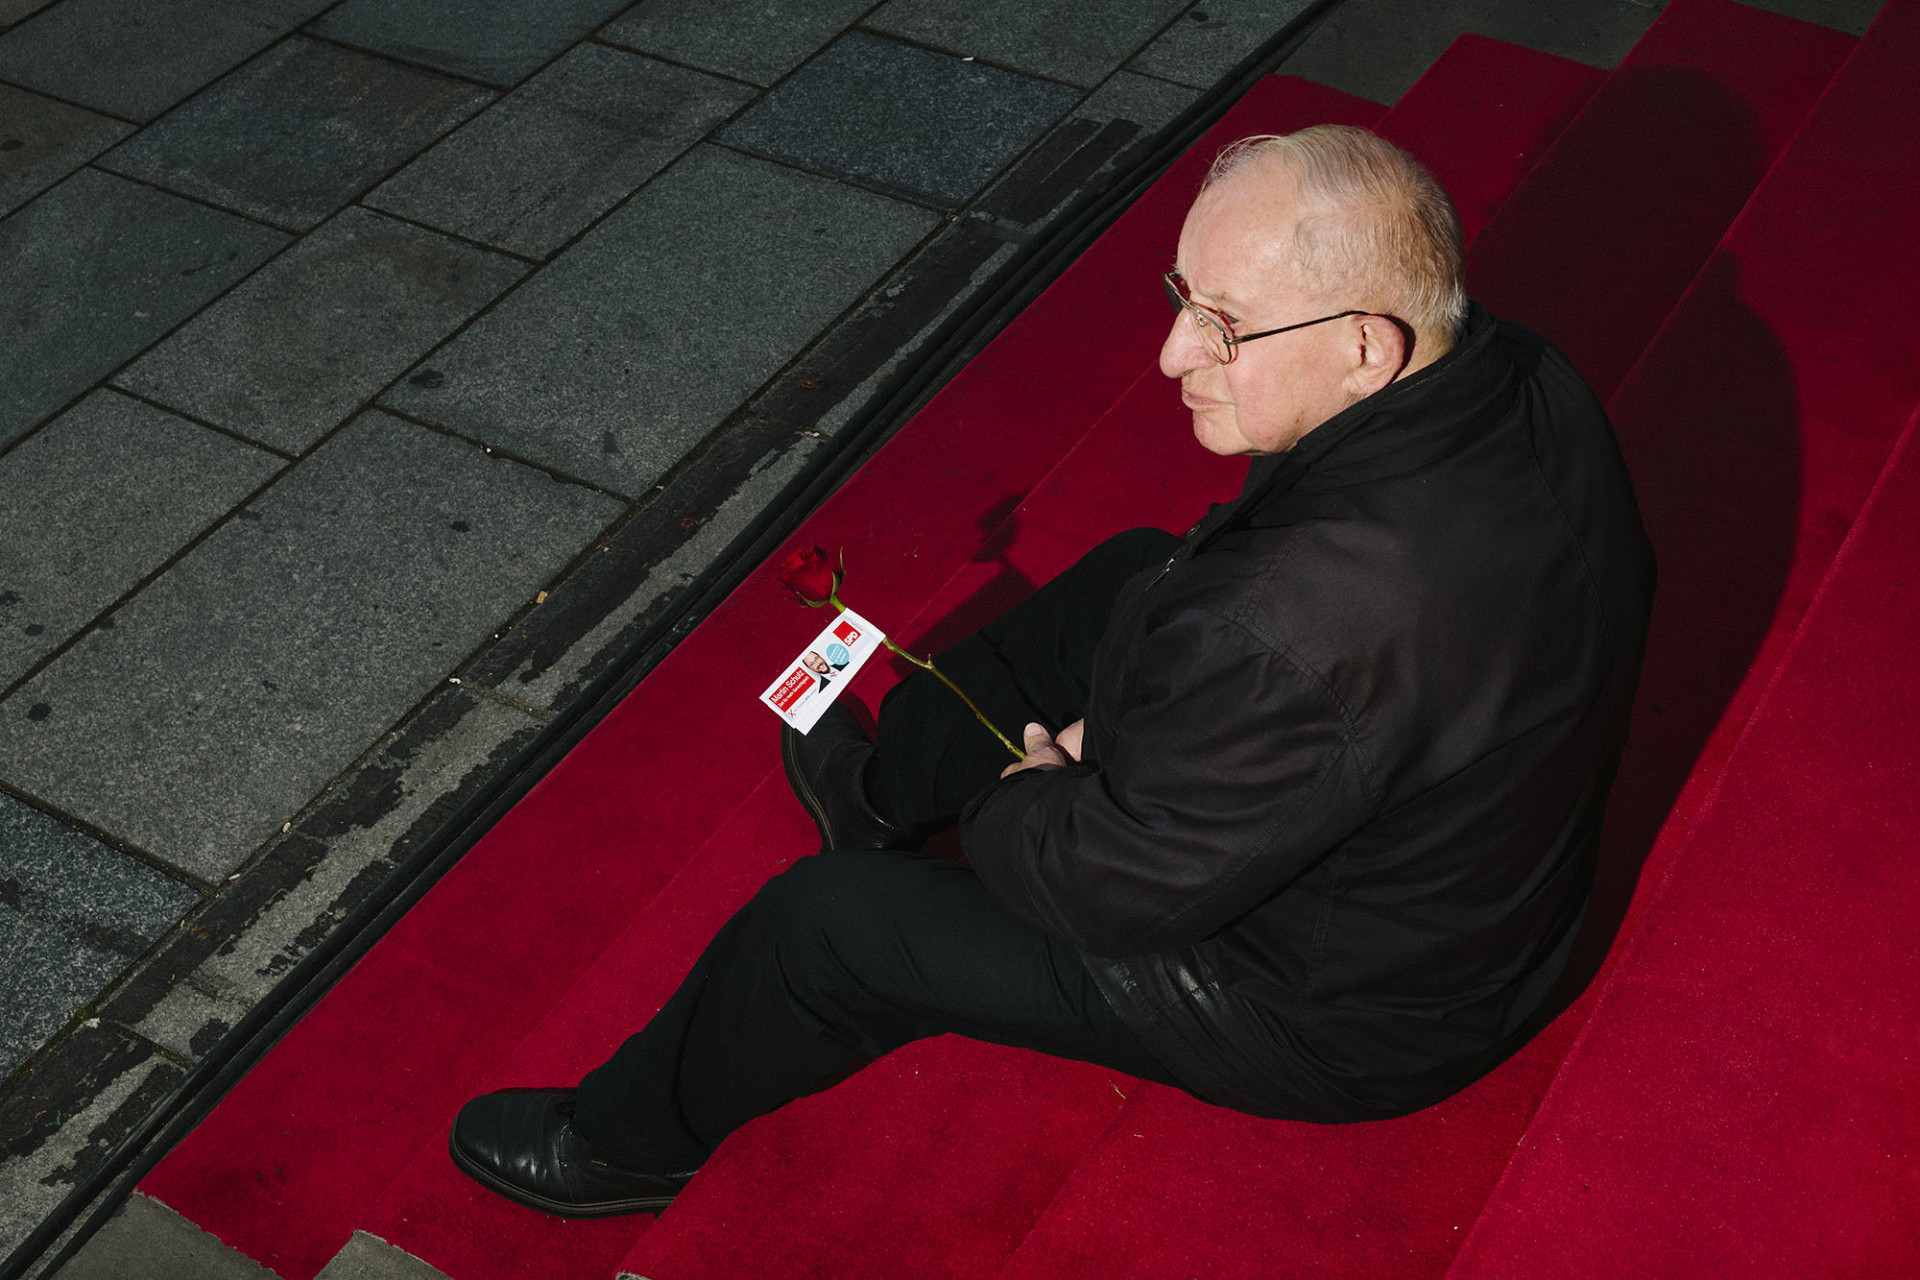 Marcus Glahn »Rote Rosen für Martin« – Commissioned